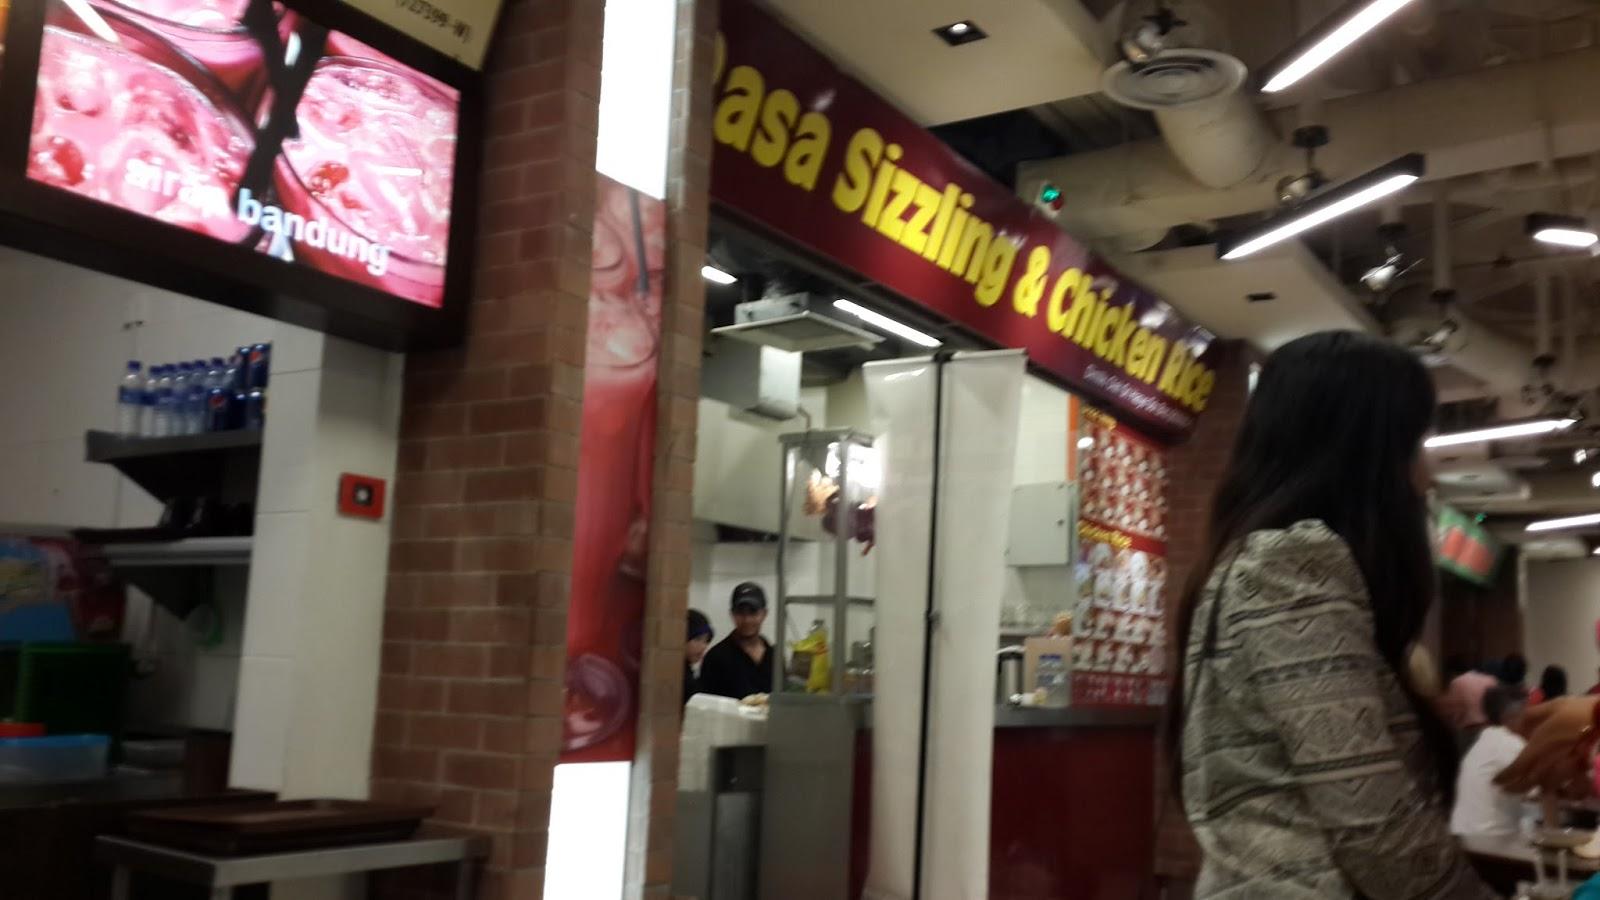 Subang Parade Food Court